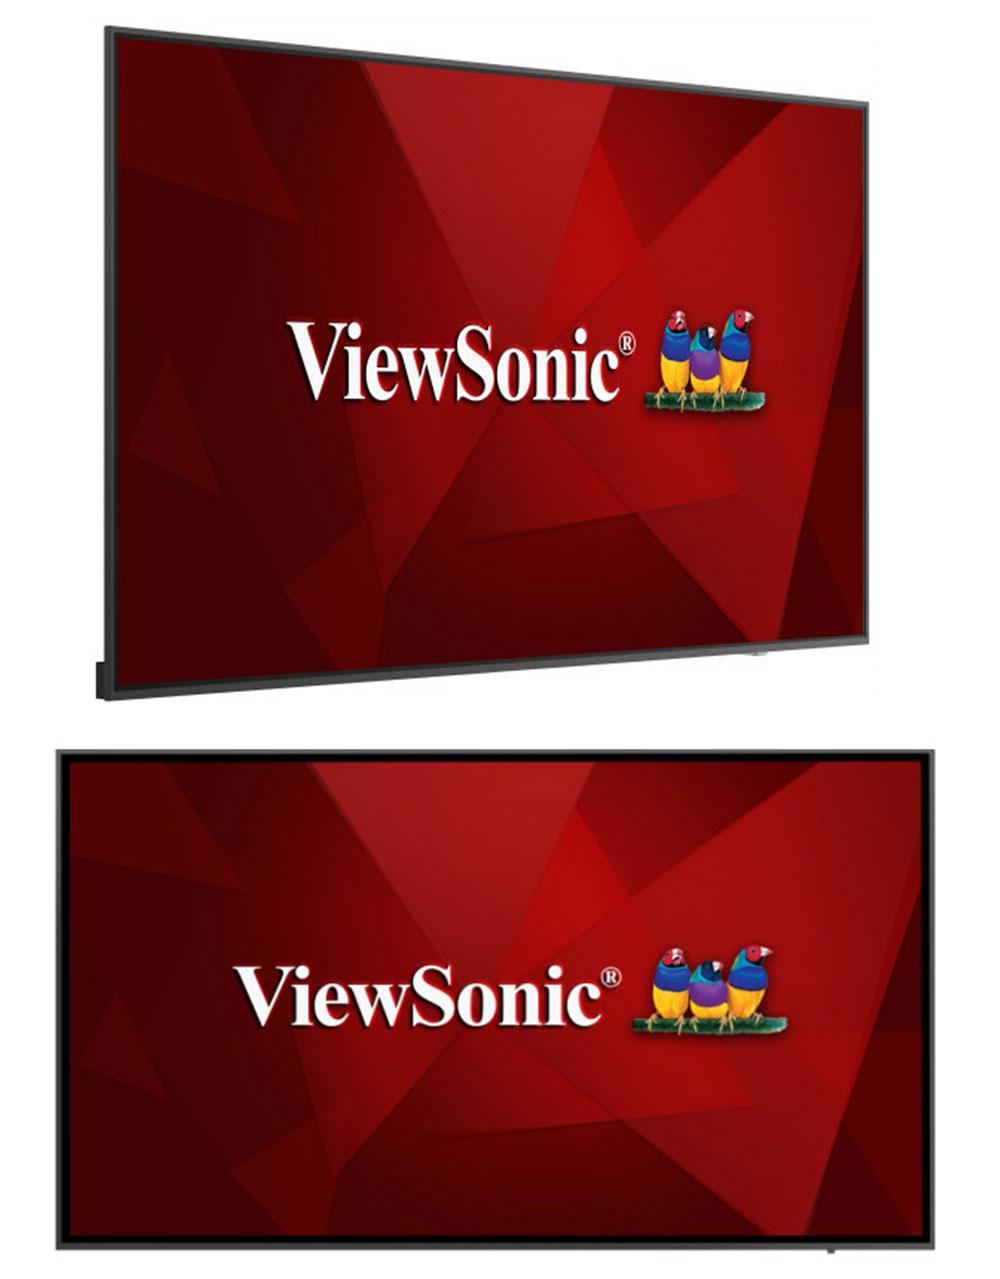 ViewSonic Wireless Presentation Display